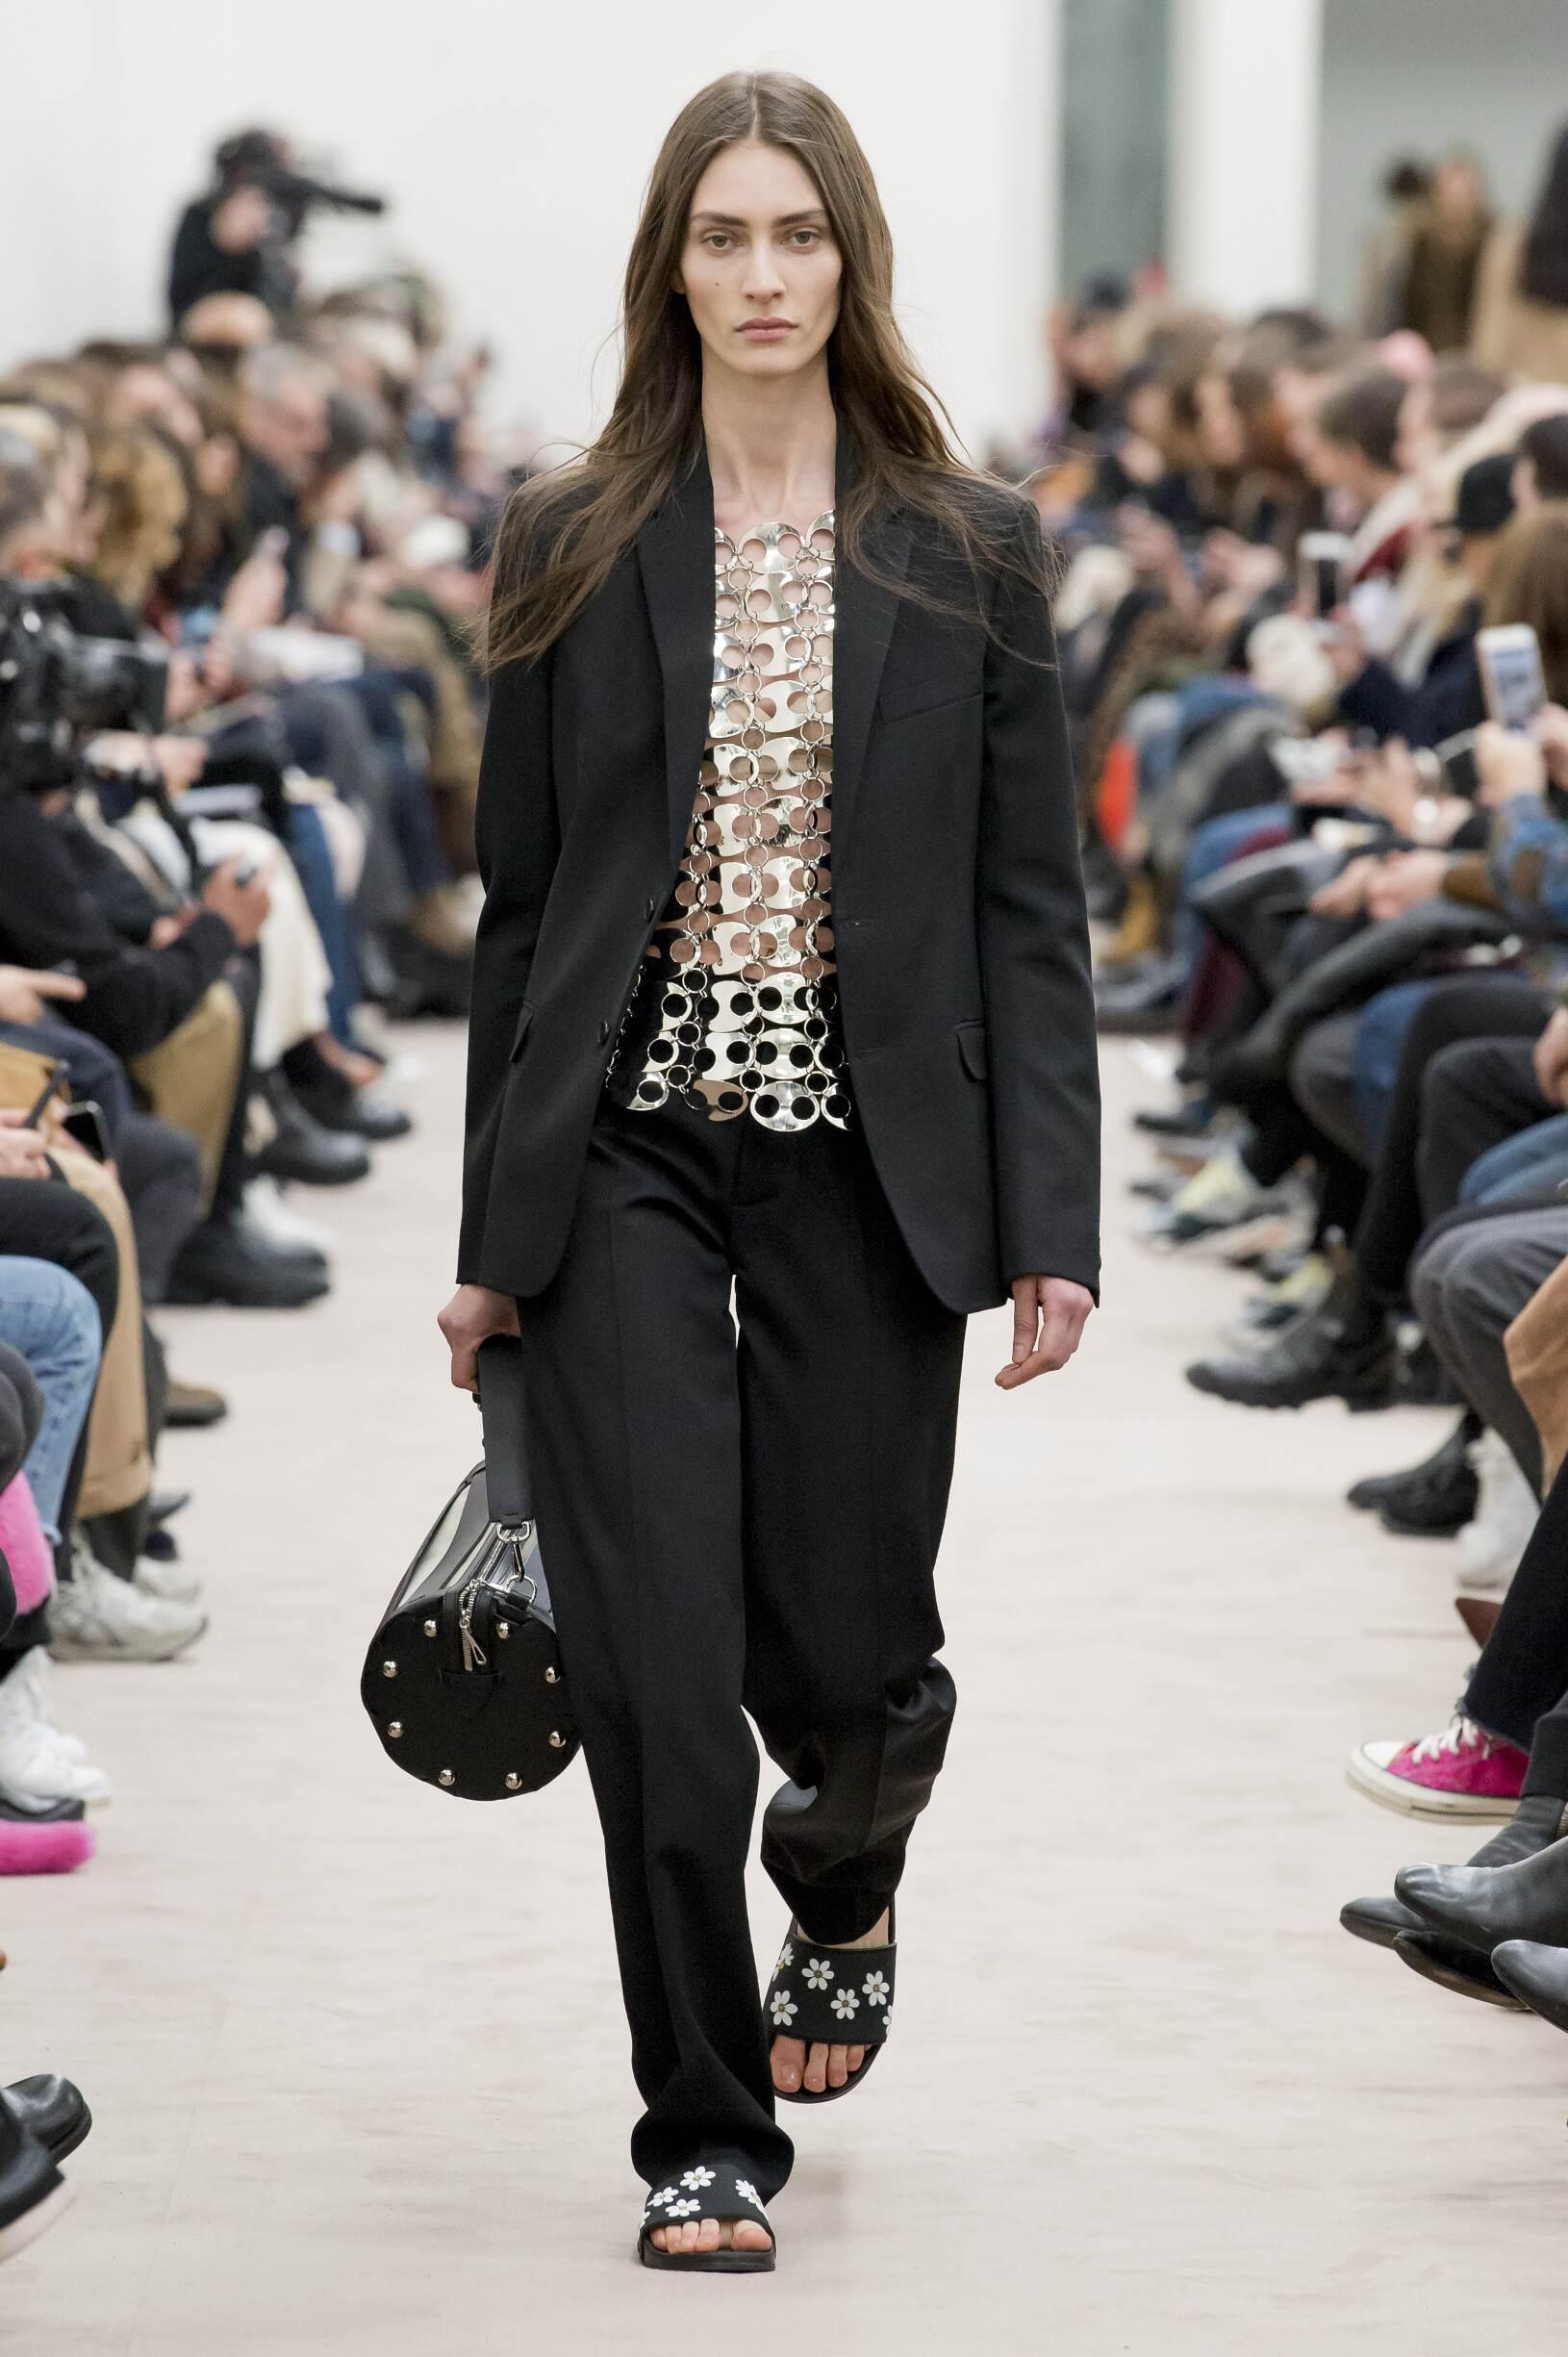 Fashion Model Paco Rabanne Catwalk